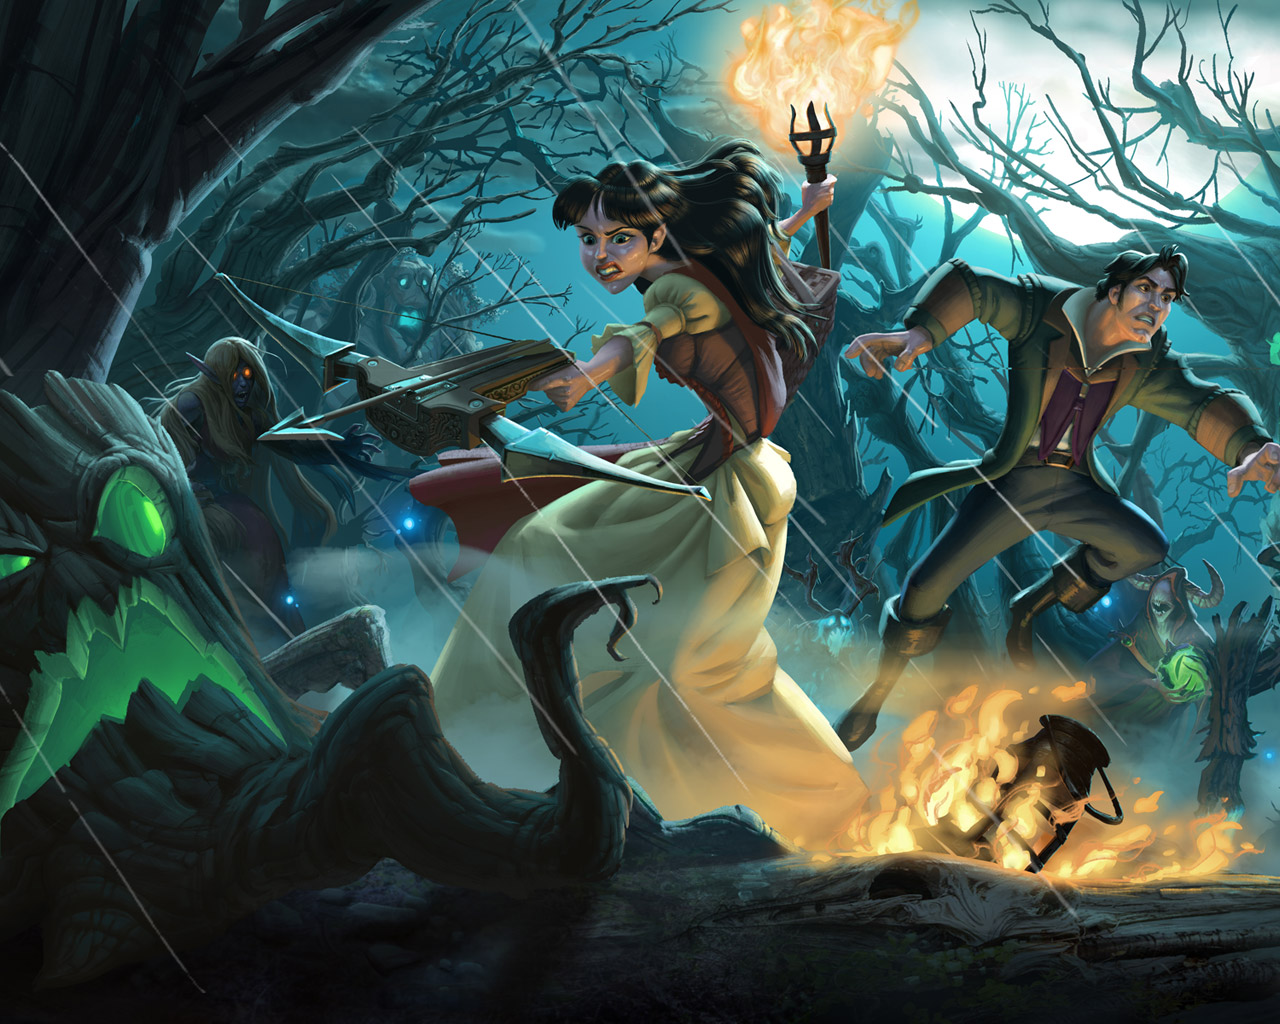 Free Hearthstone: Heroes of Warcraft Wallpaper in 1280x1024